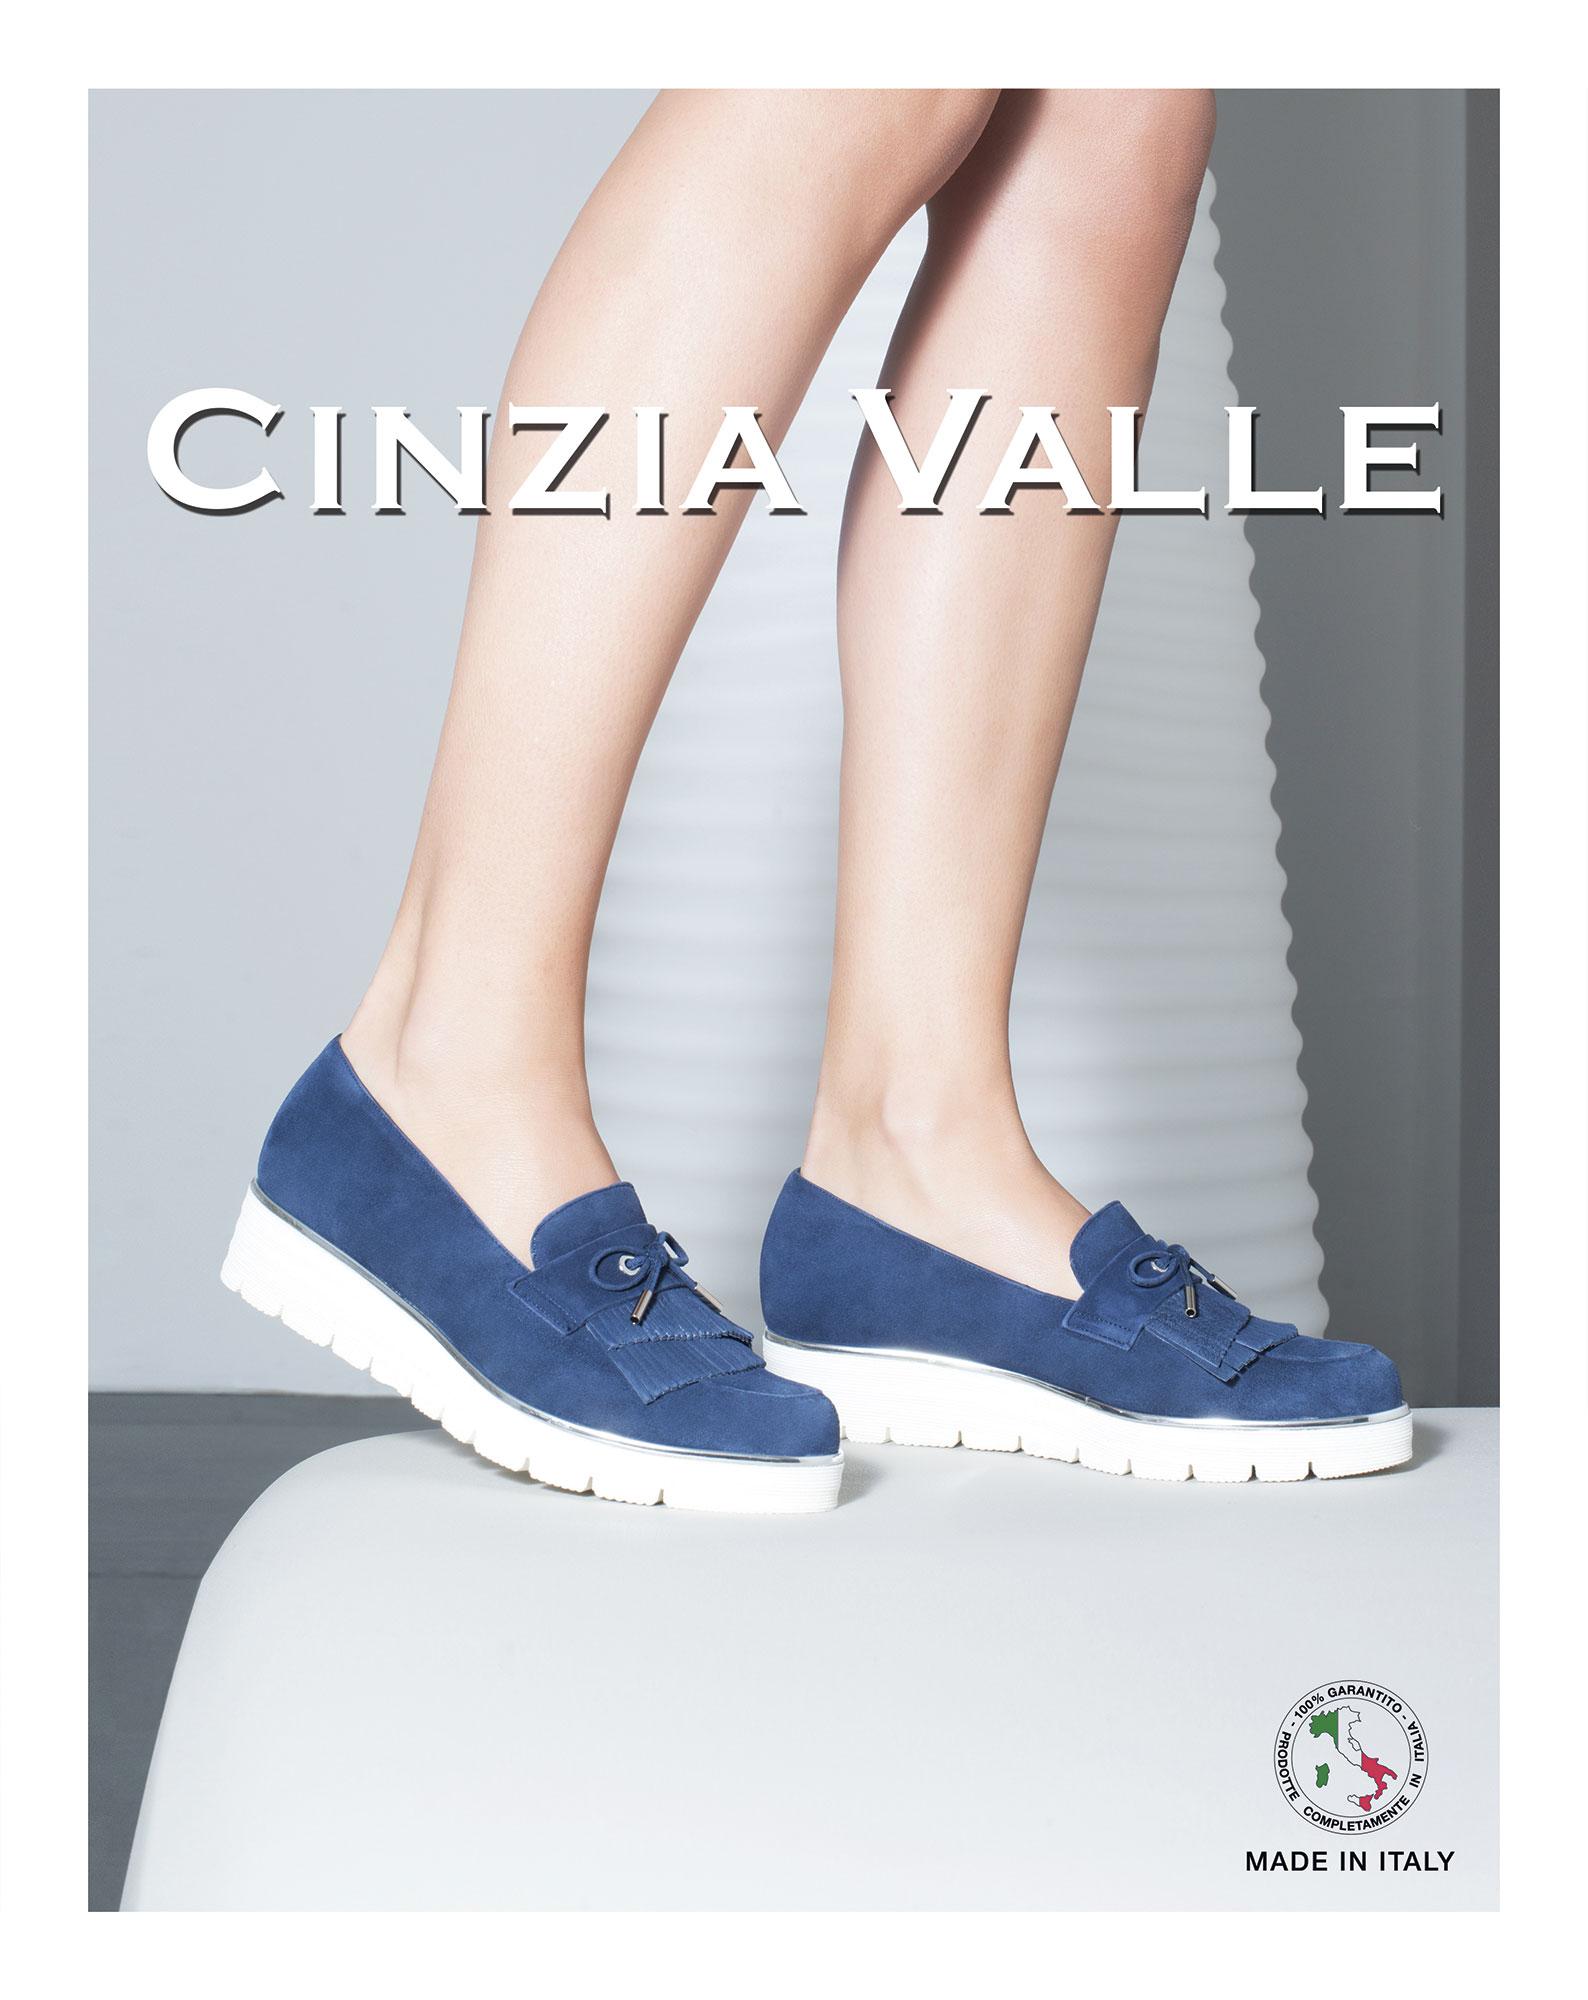 meet 8d7e3 54745 Calzature Calzaturificio Scarpe Confort Valle Donna Cinzia ...